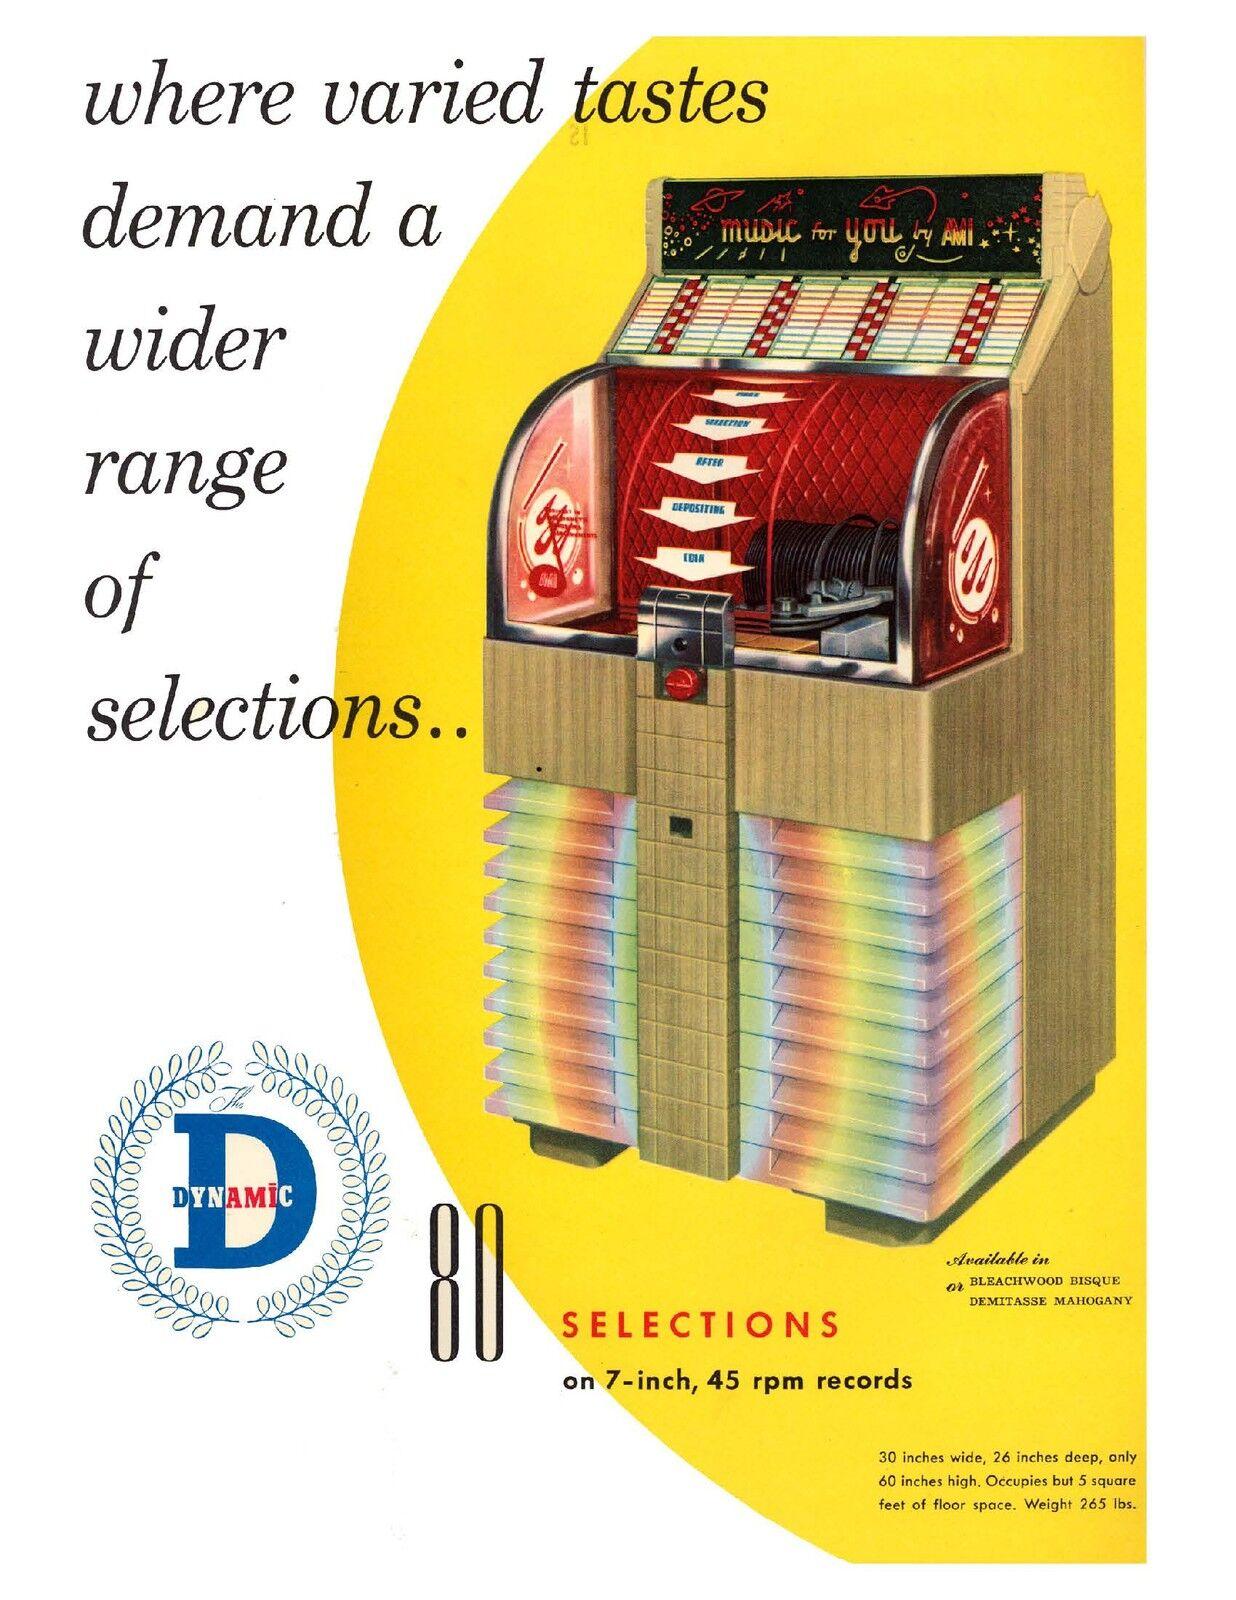 rowe ami jukebox manual pdf